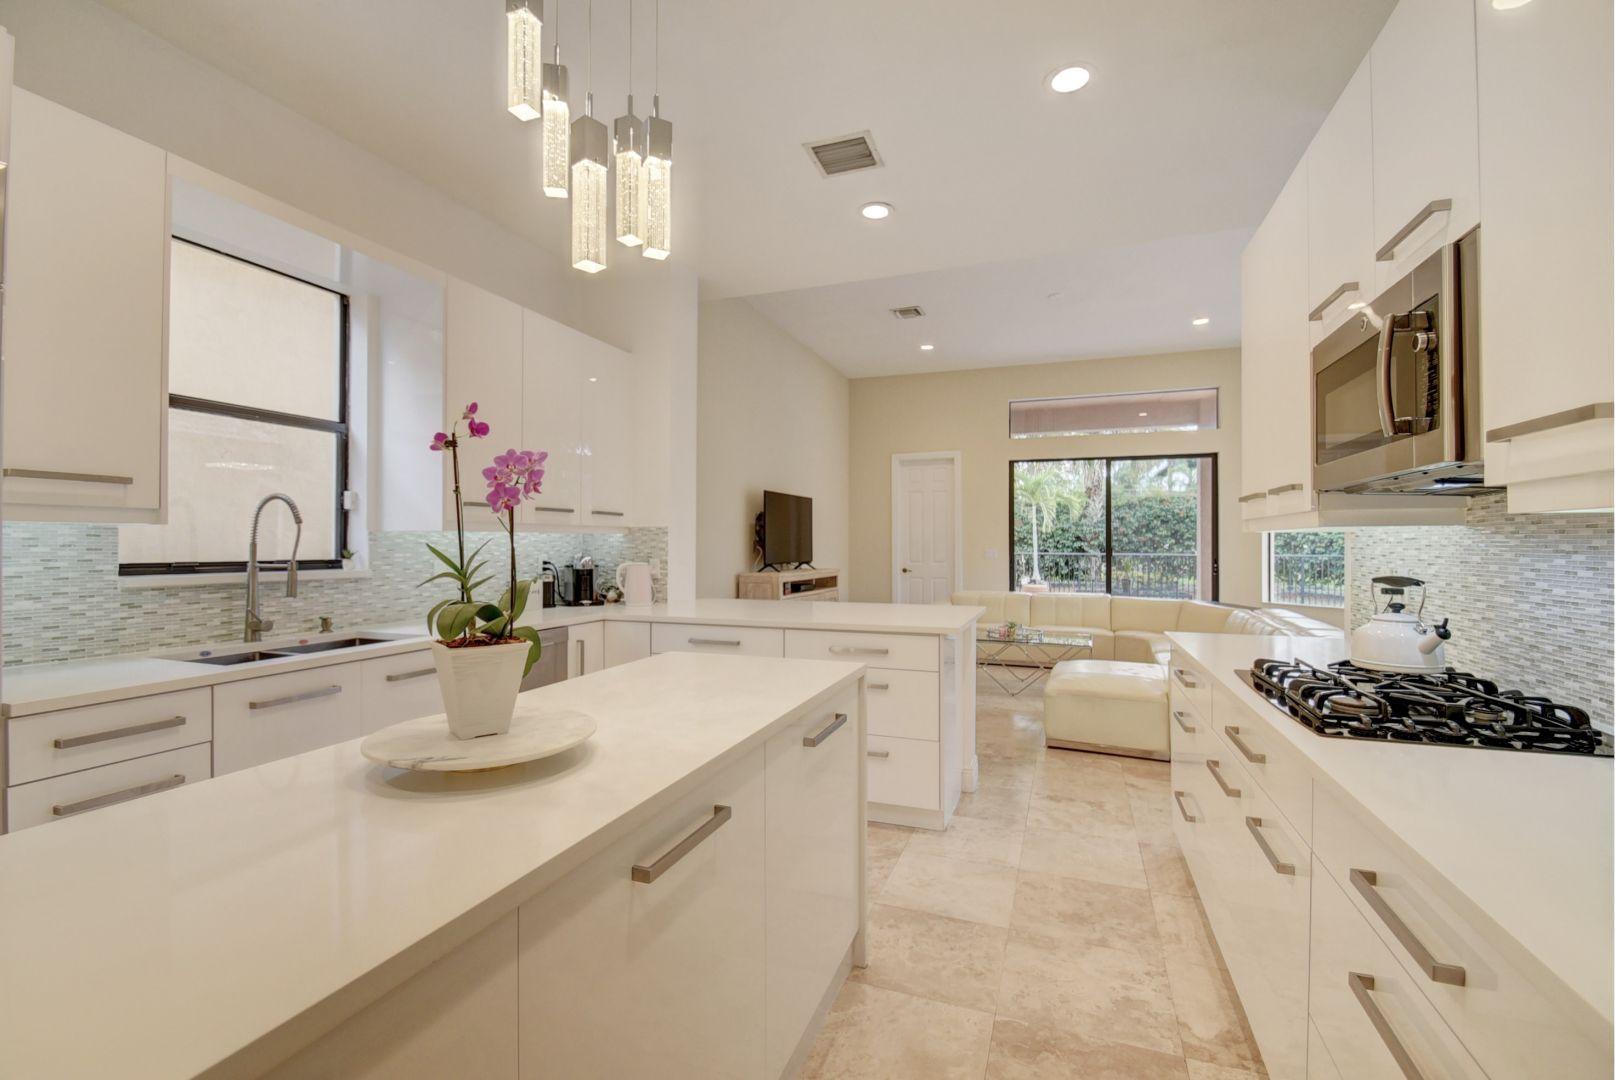 16034 Rosecroft Terrace Delray Beach FL 33446 - photo 7